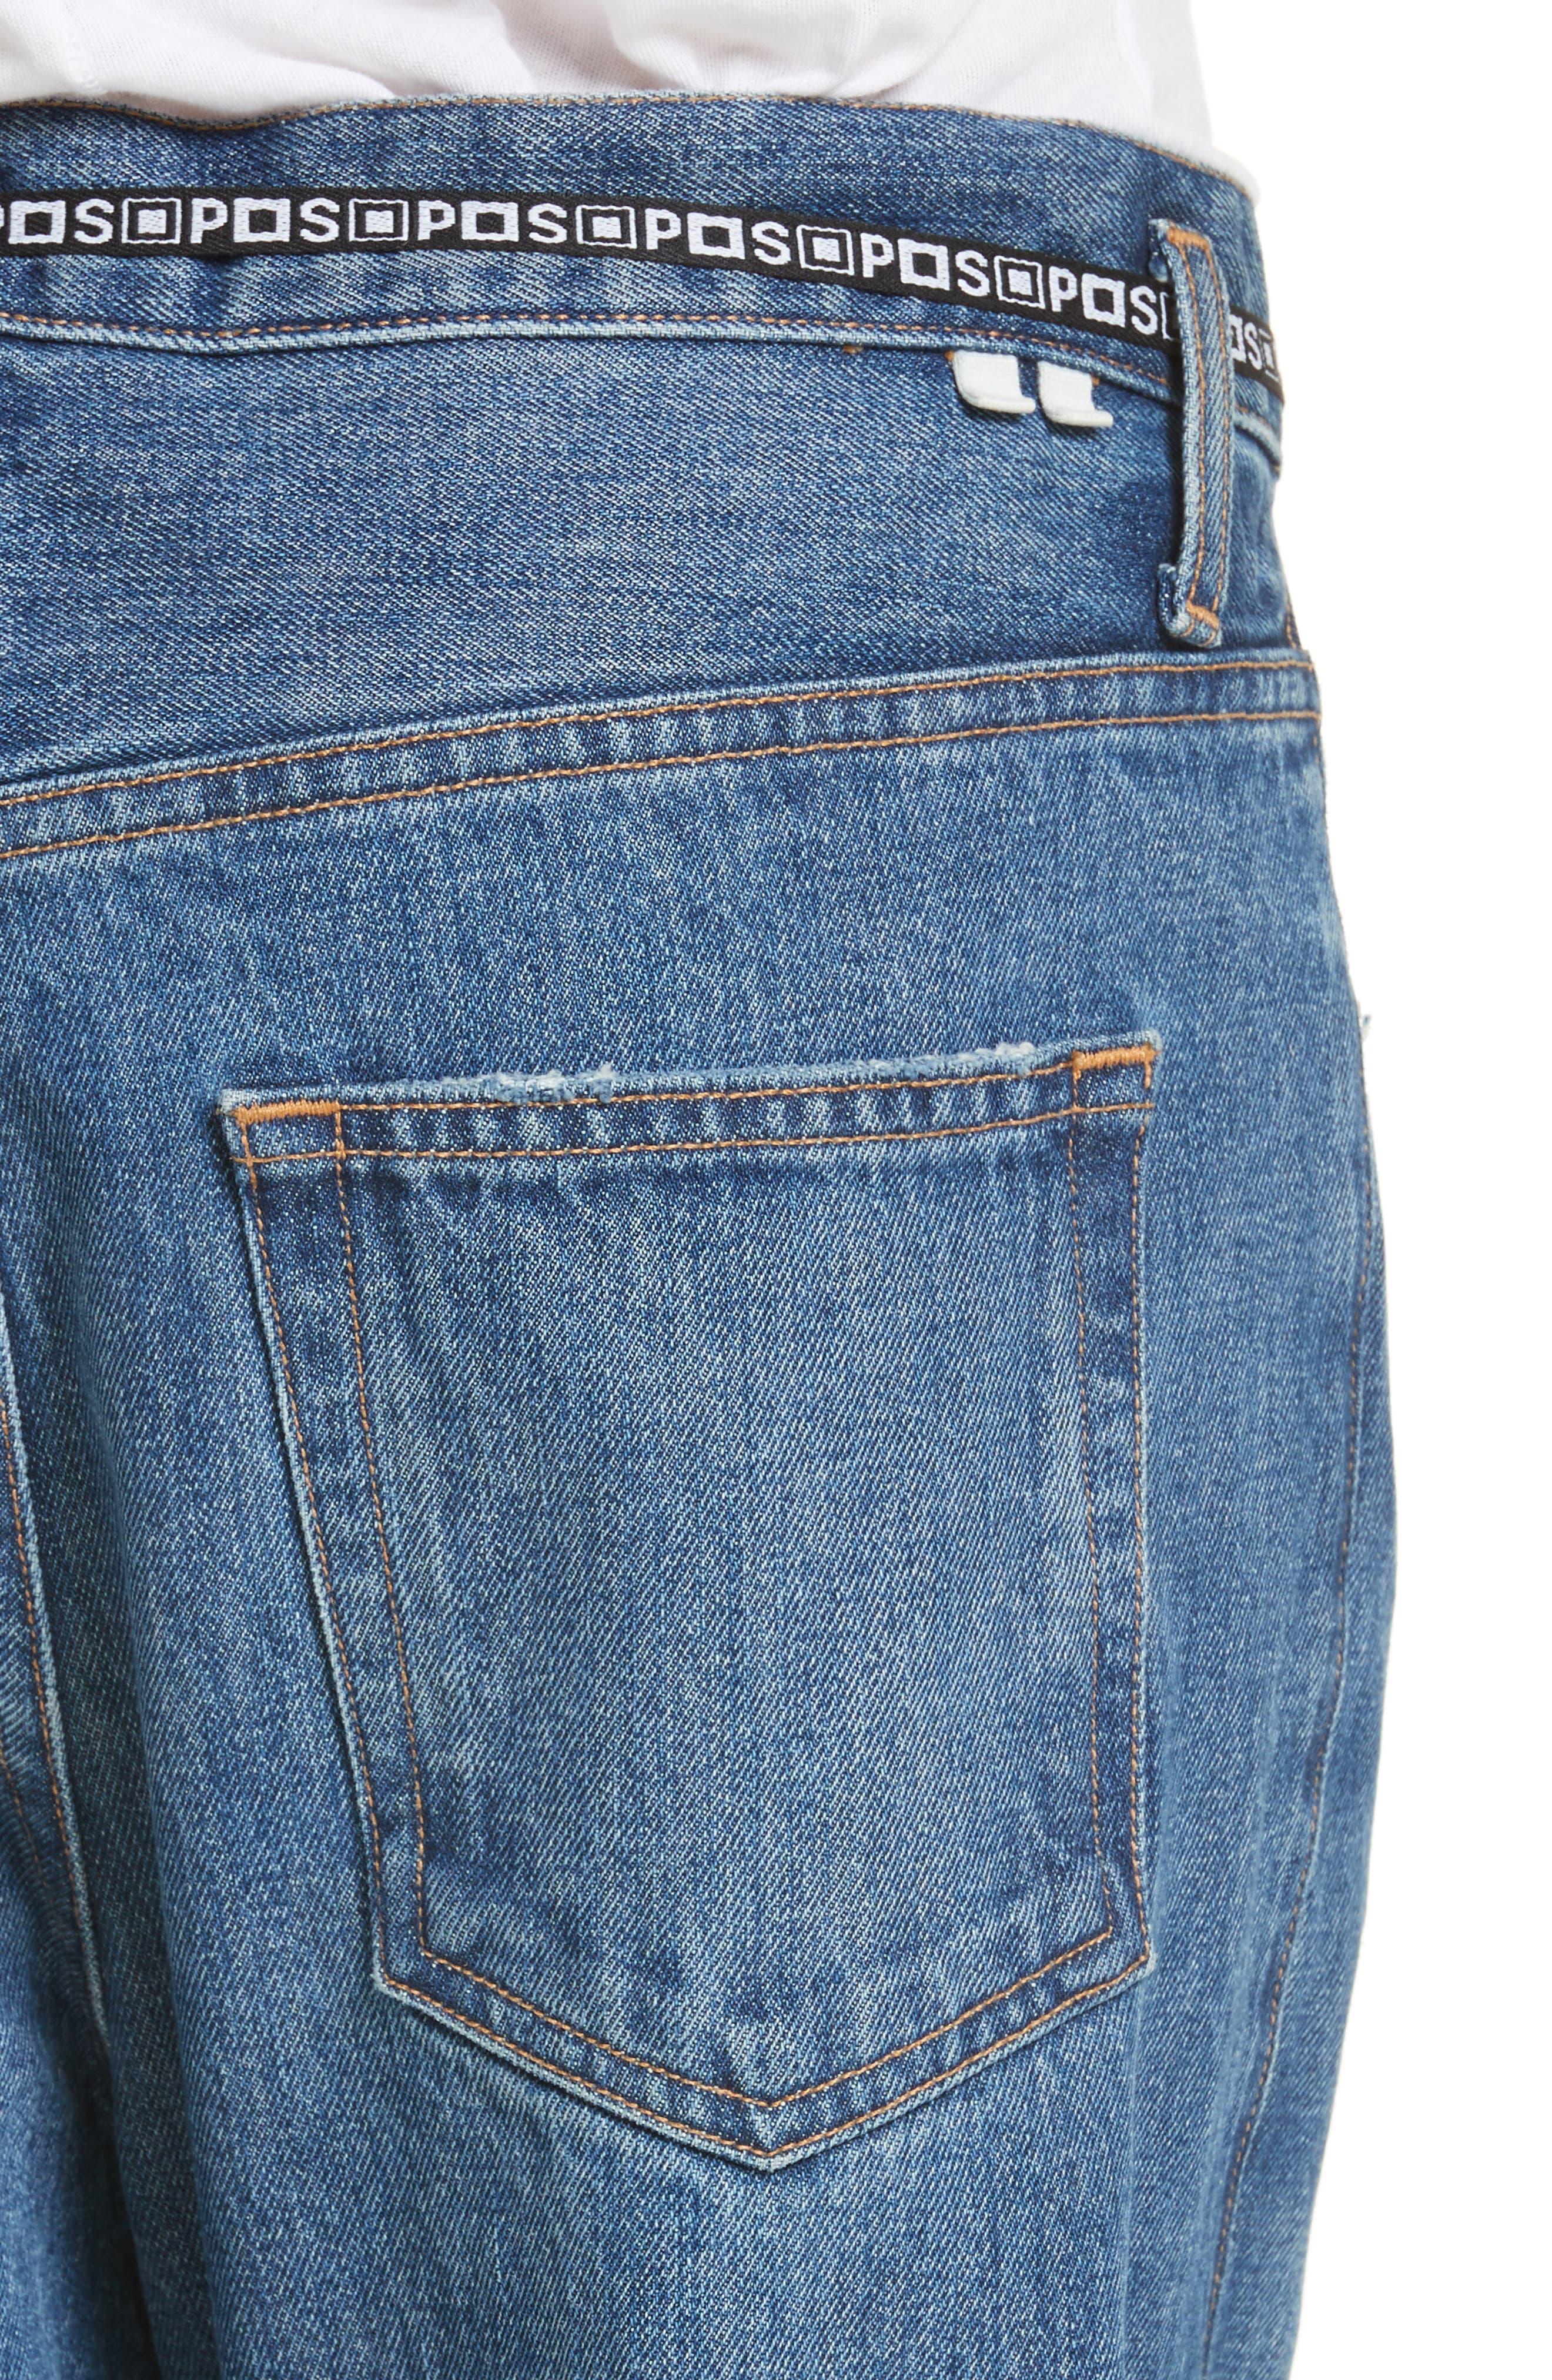 PSWL Cuffed Straight Leg Jeans,                             Alternate thumbnail 6, color,                             Medium Blue